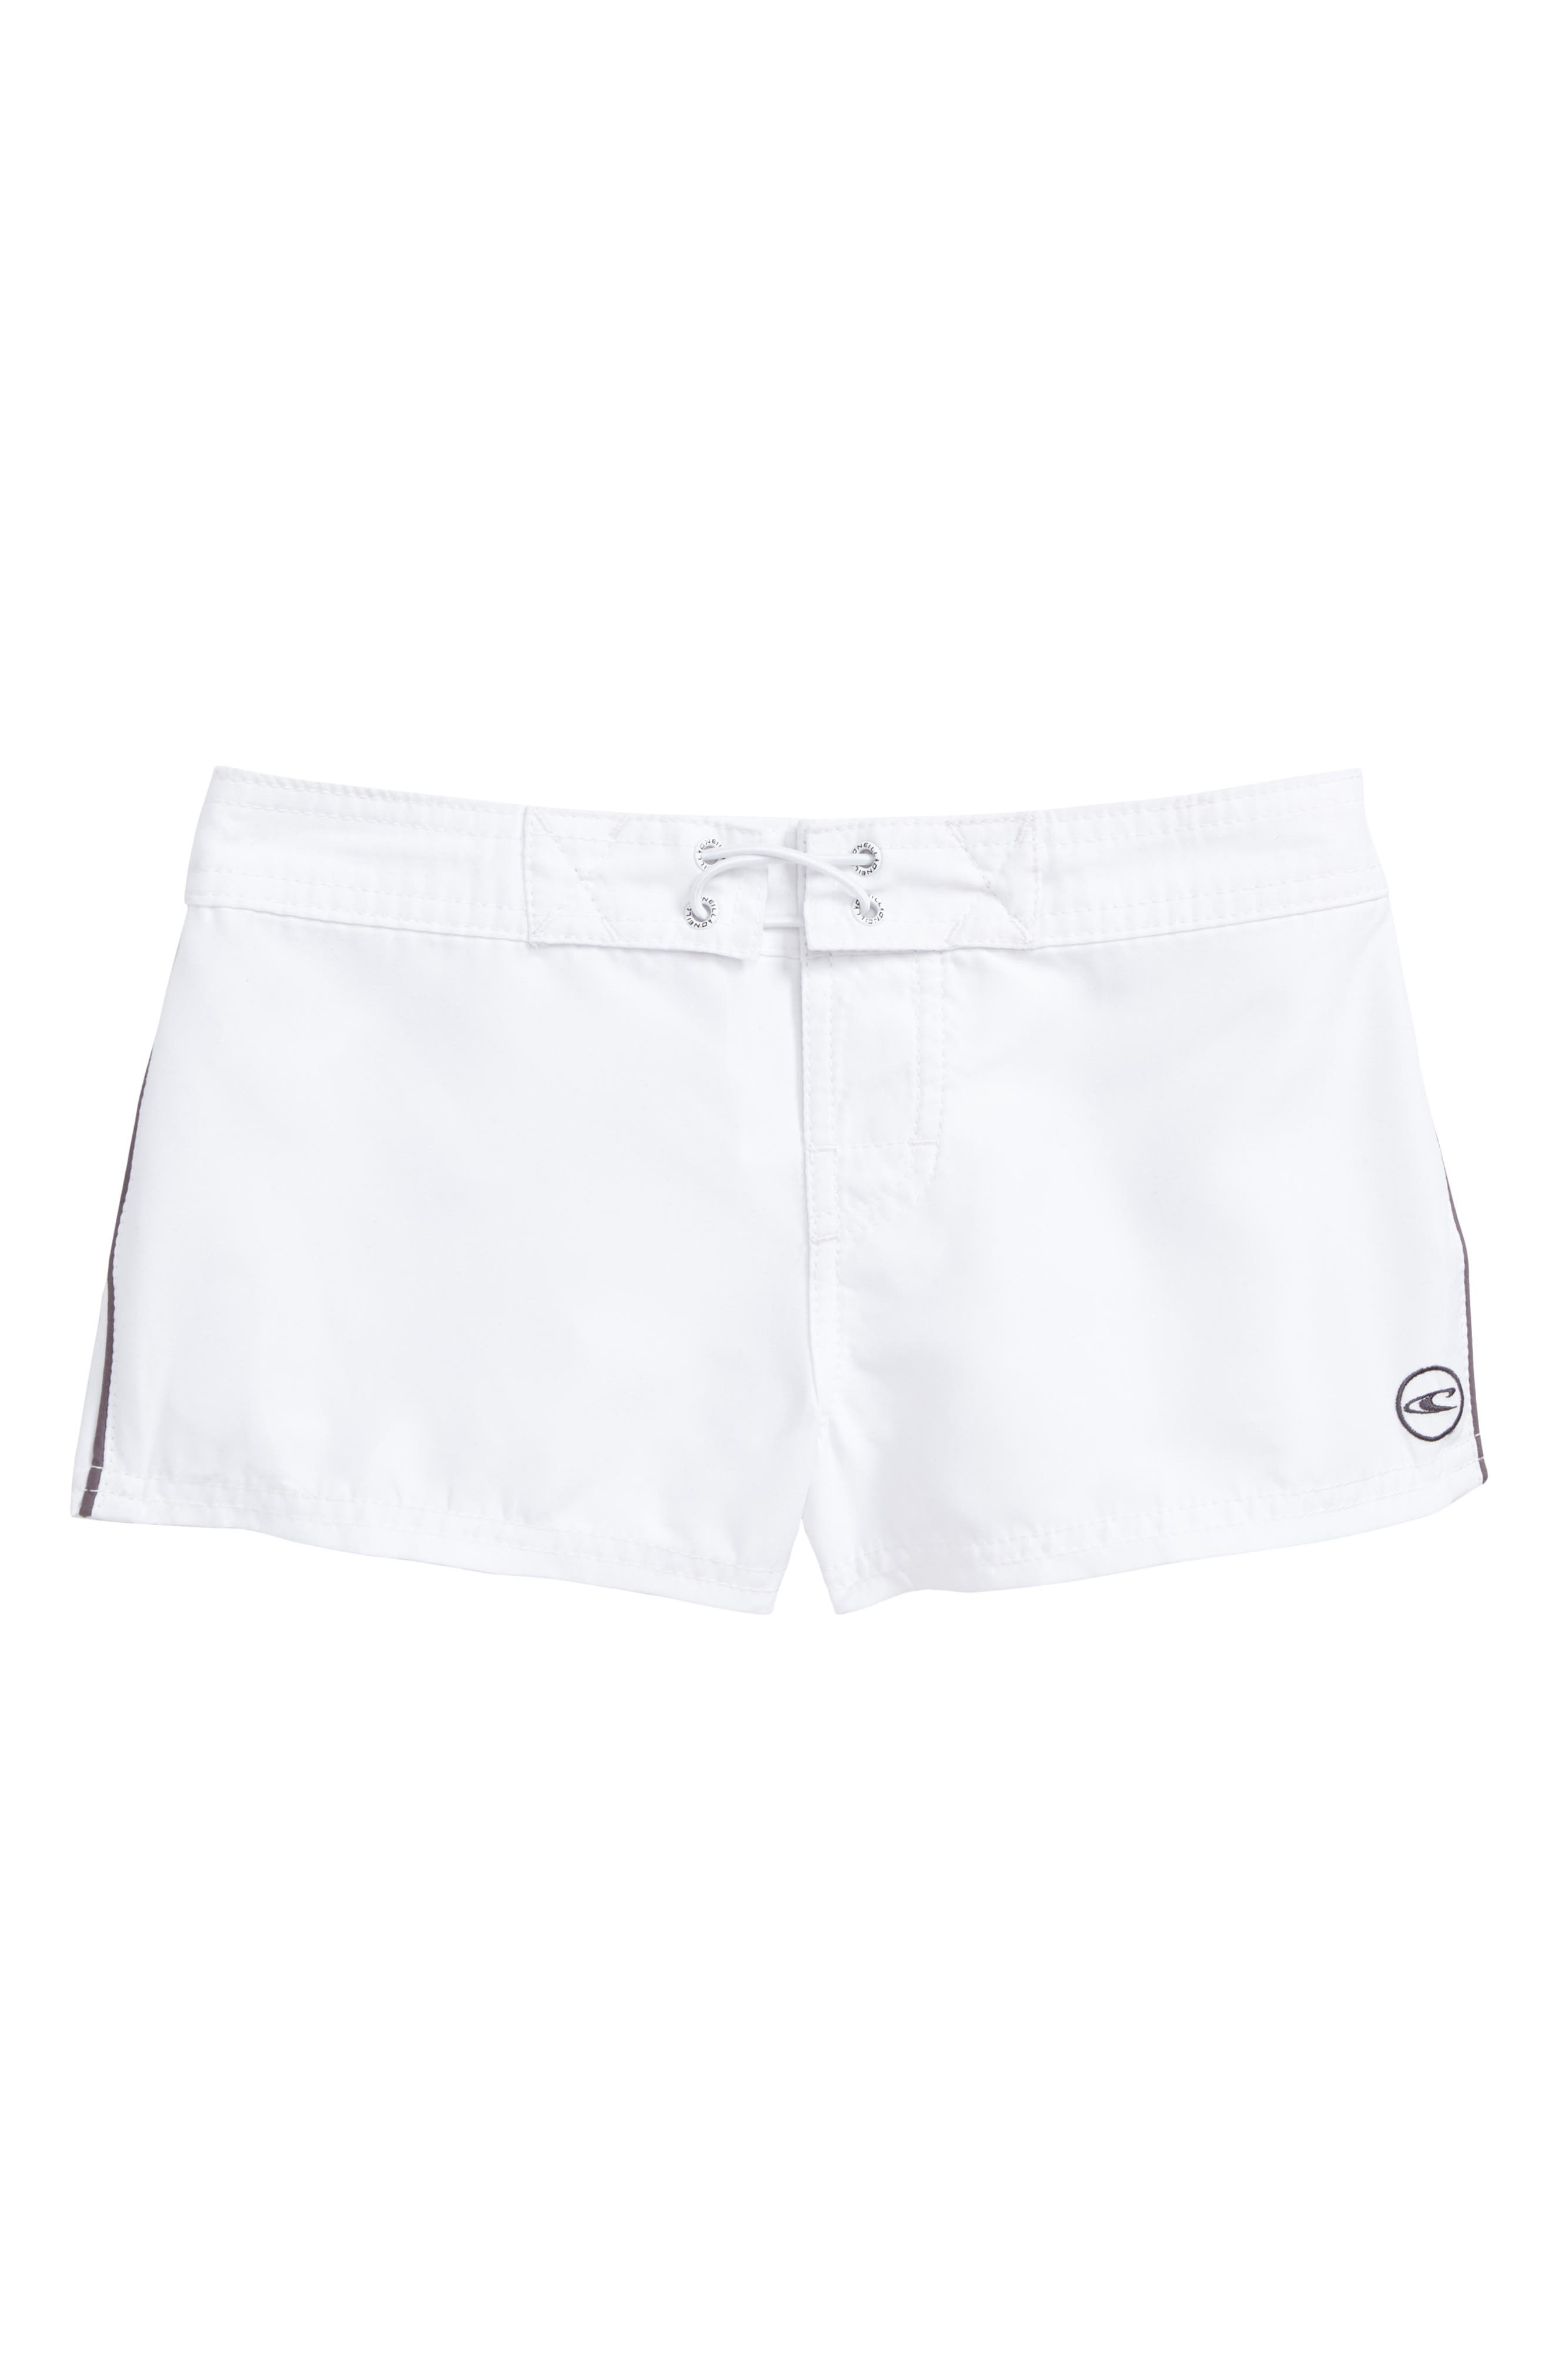 Alternate Image 1 Selected - O'Neill Salt Water Board Shorts (Big Girls)